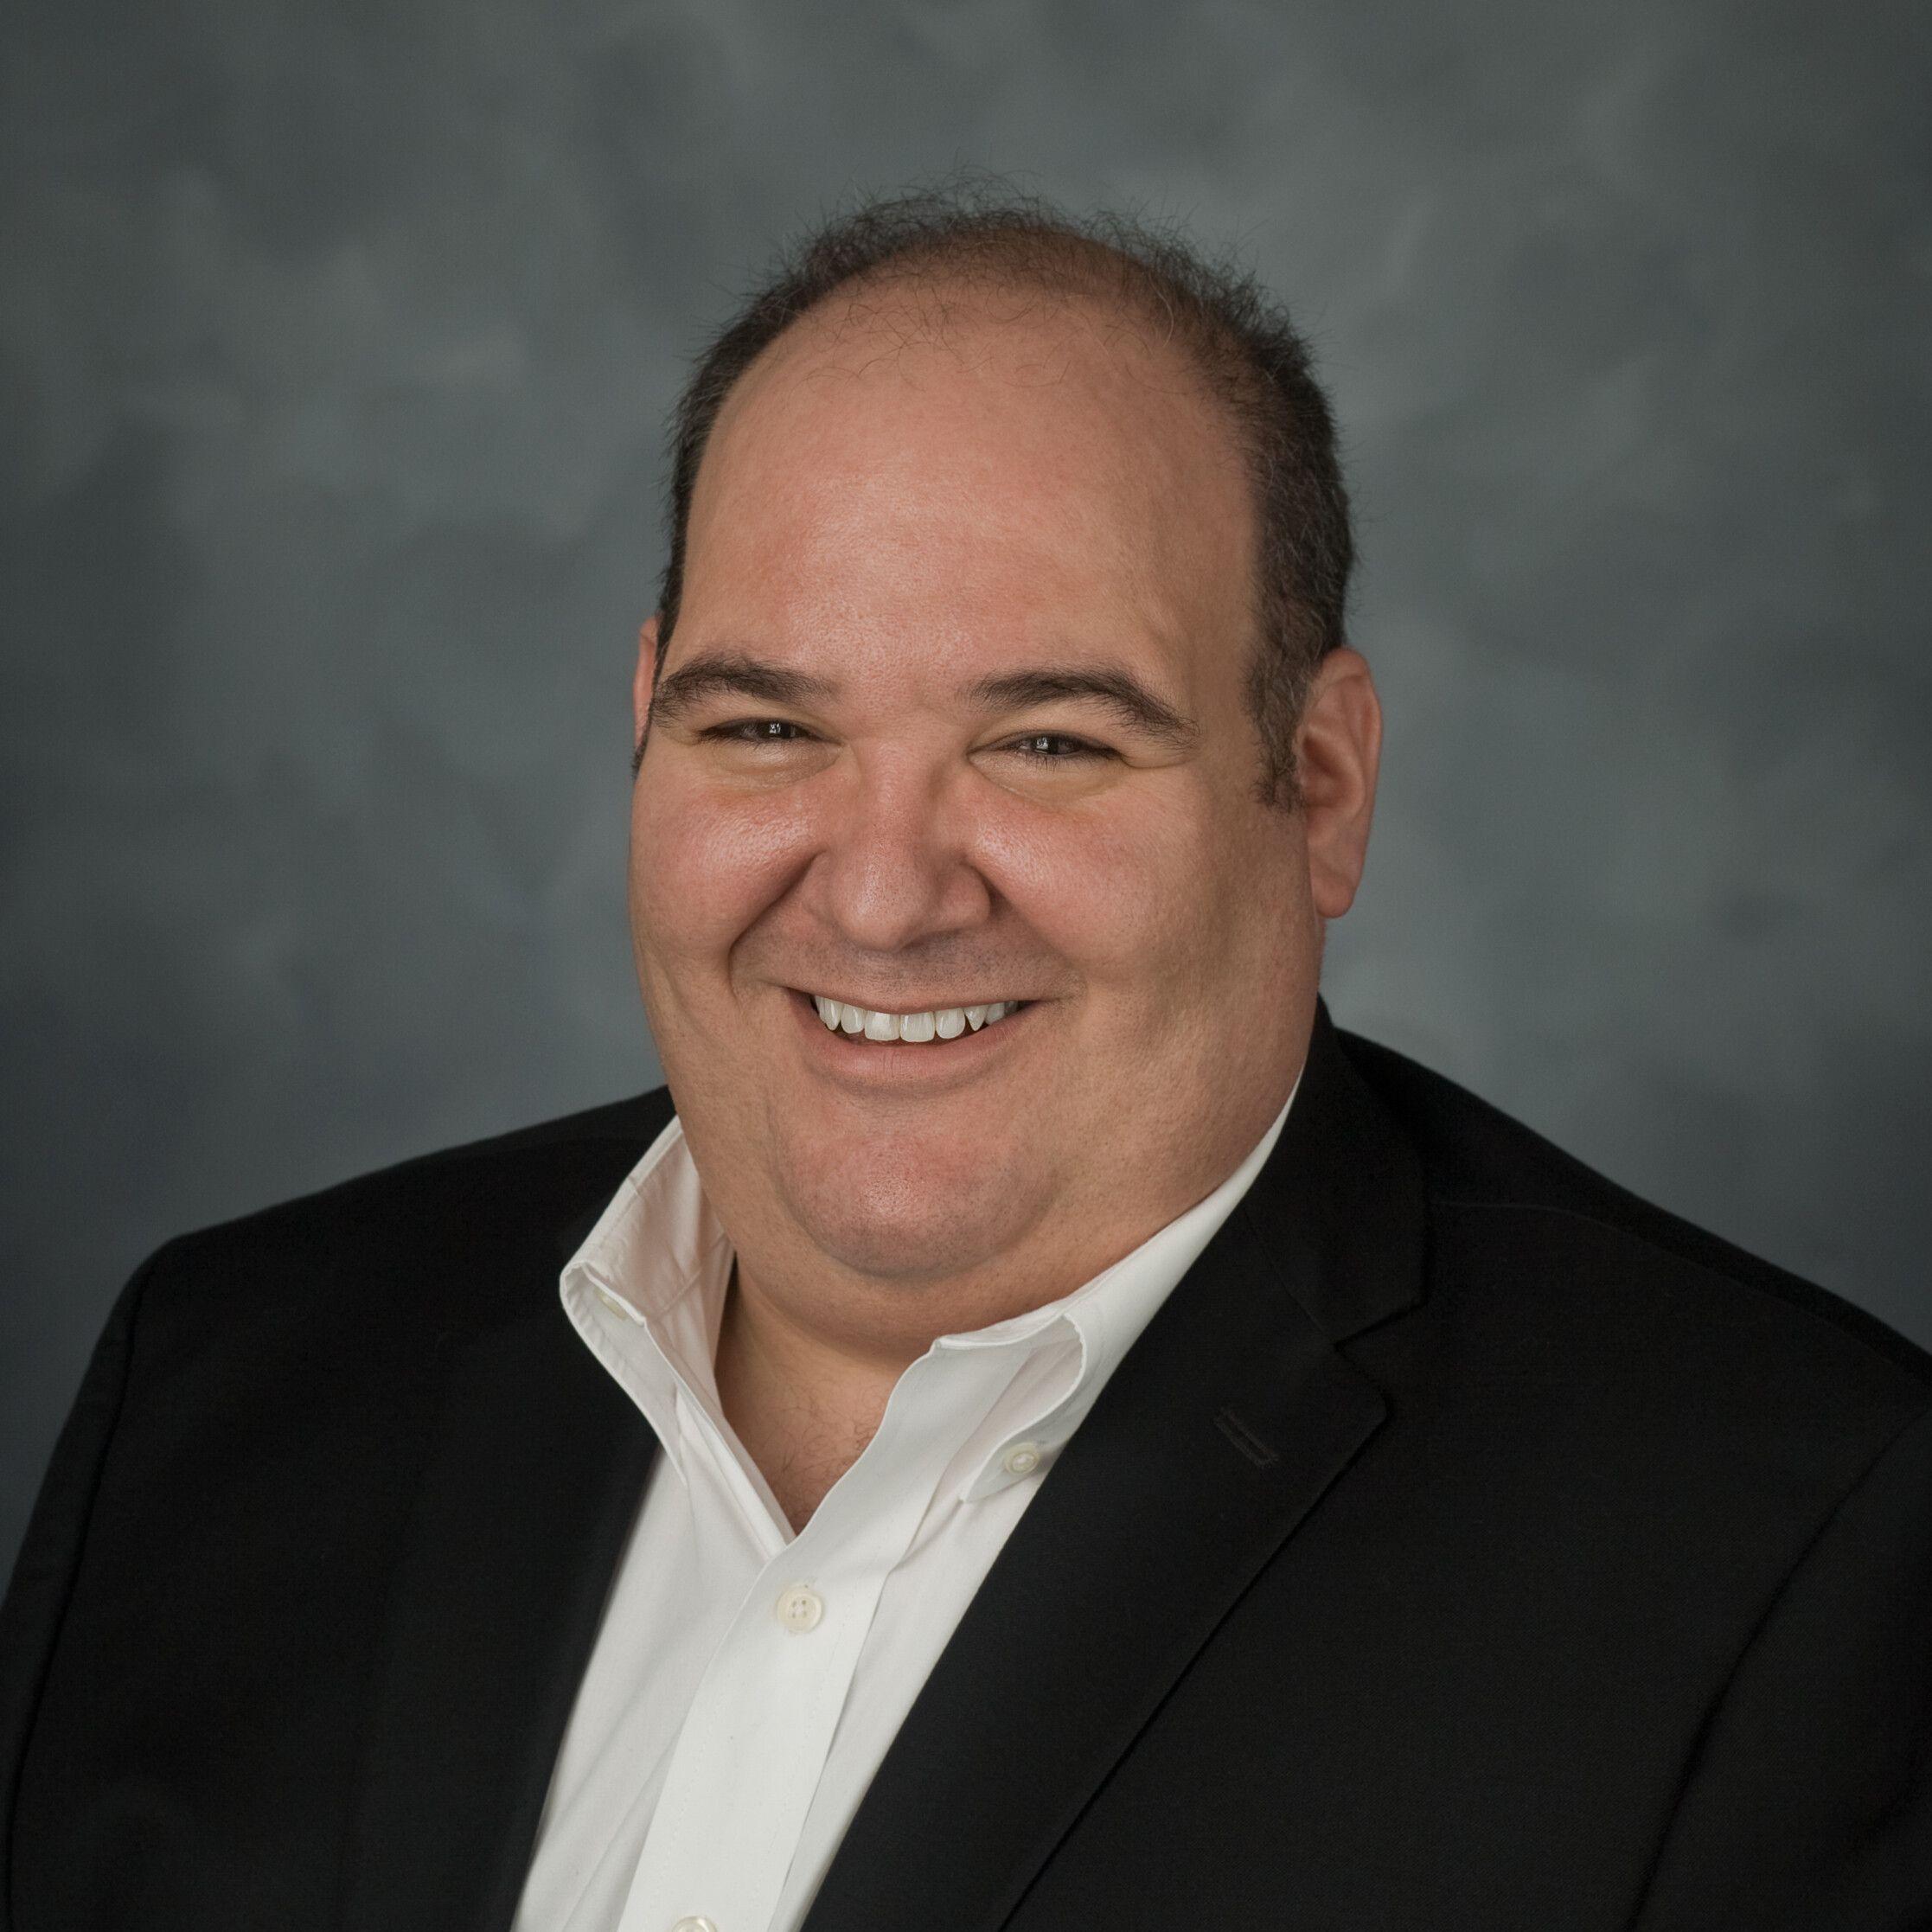 Michael J. Kaufman